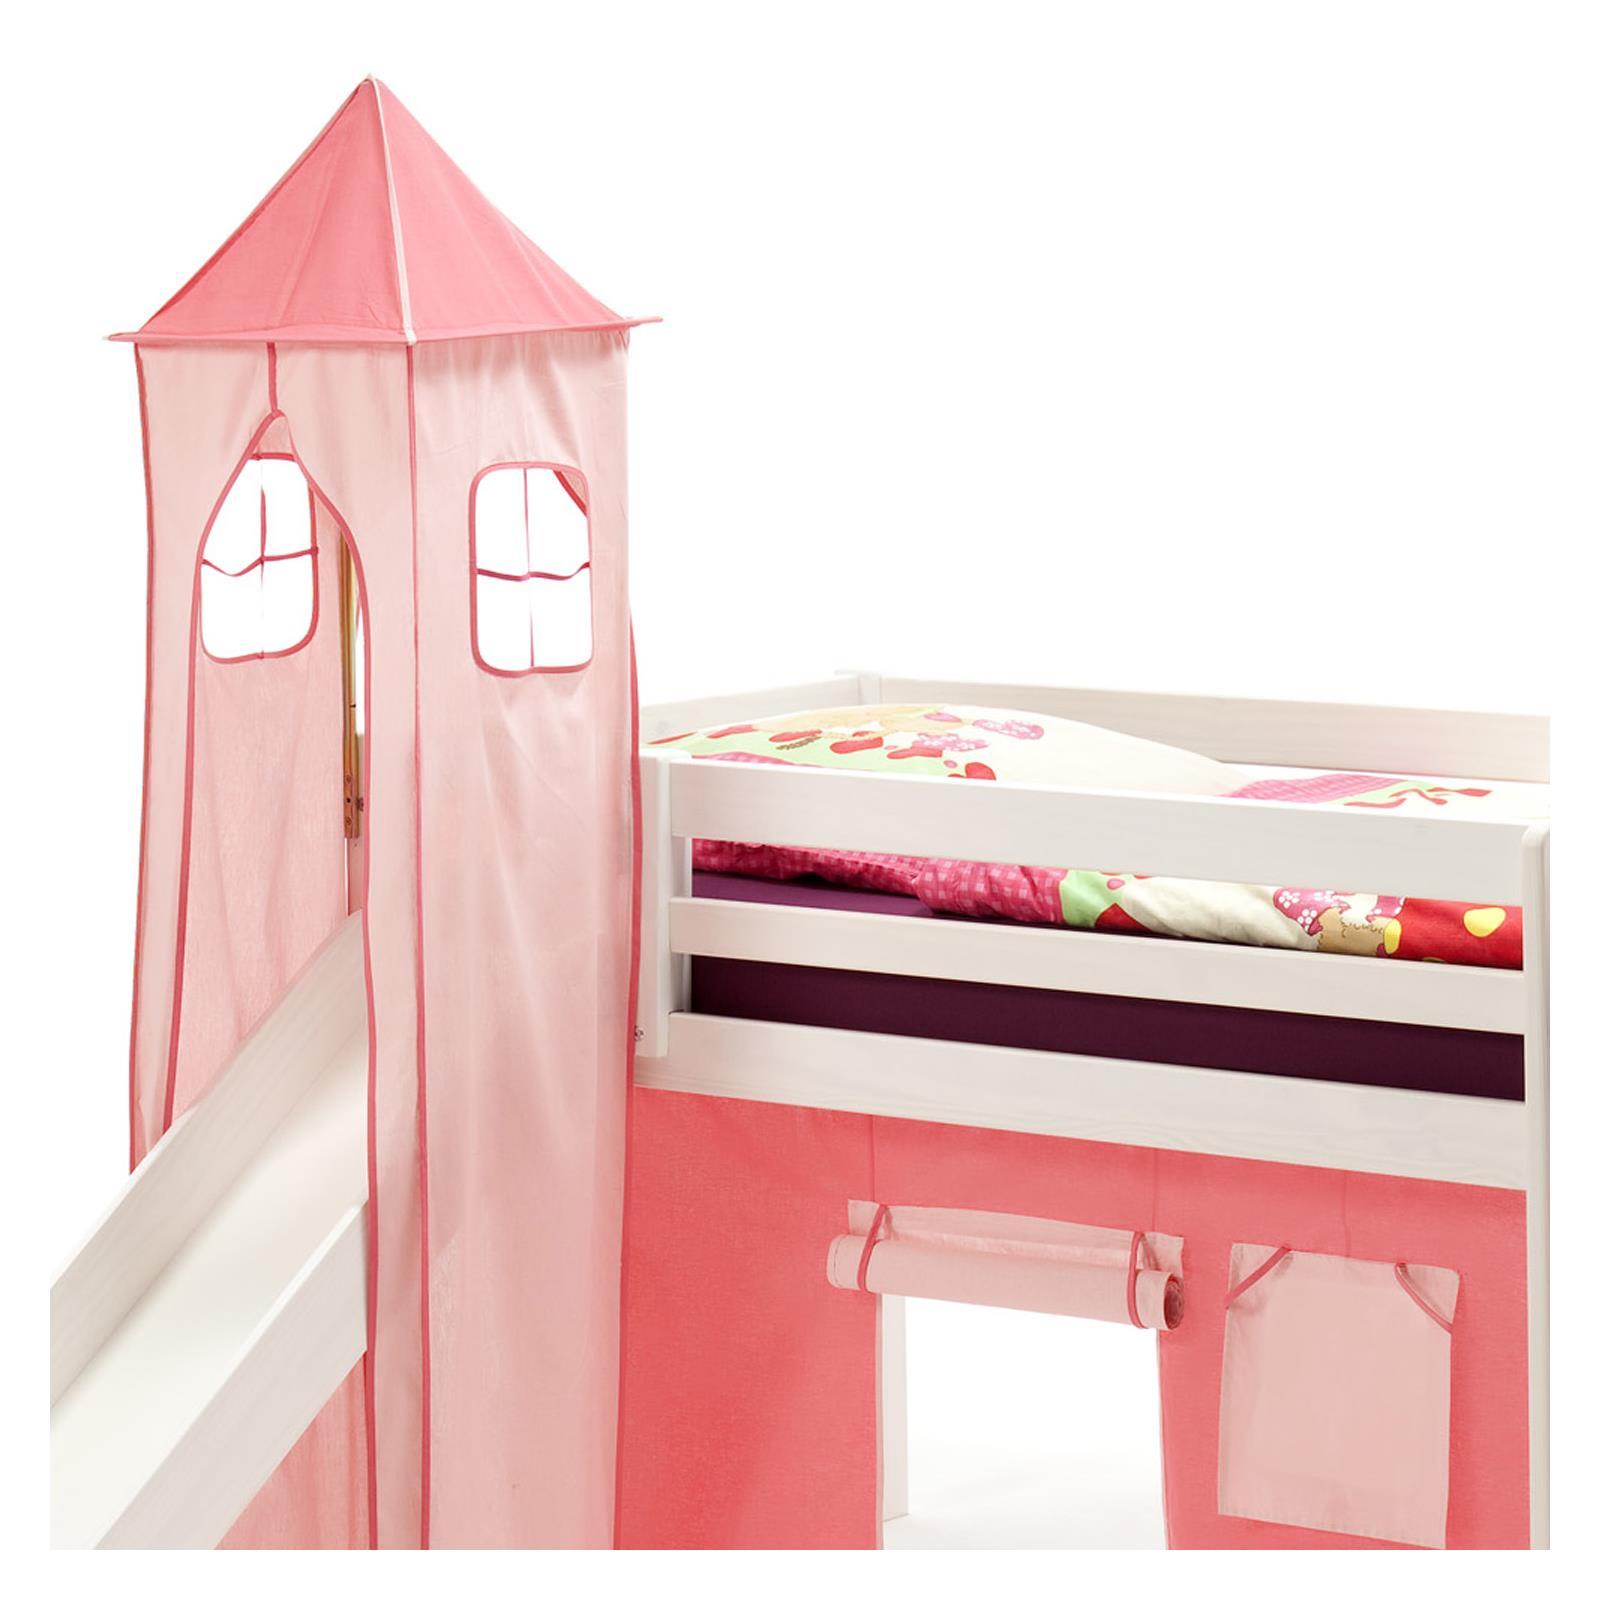 turm max zu bett mit rutsche pink rosa mobilia24. Black Bedroom Furniture Sets. Home Design Ideas